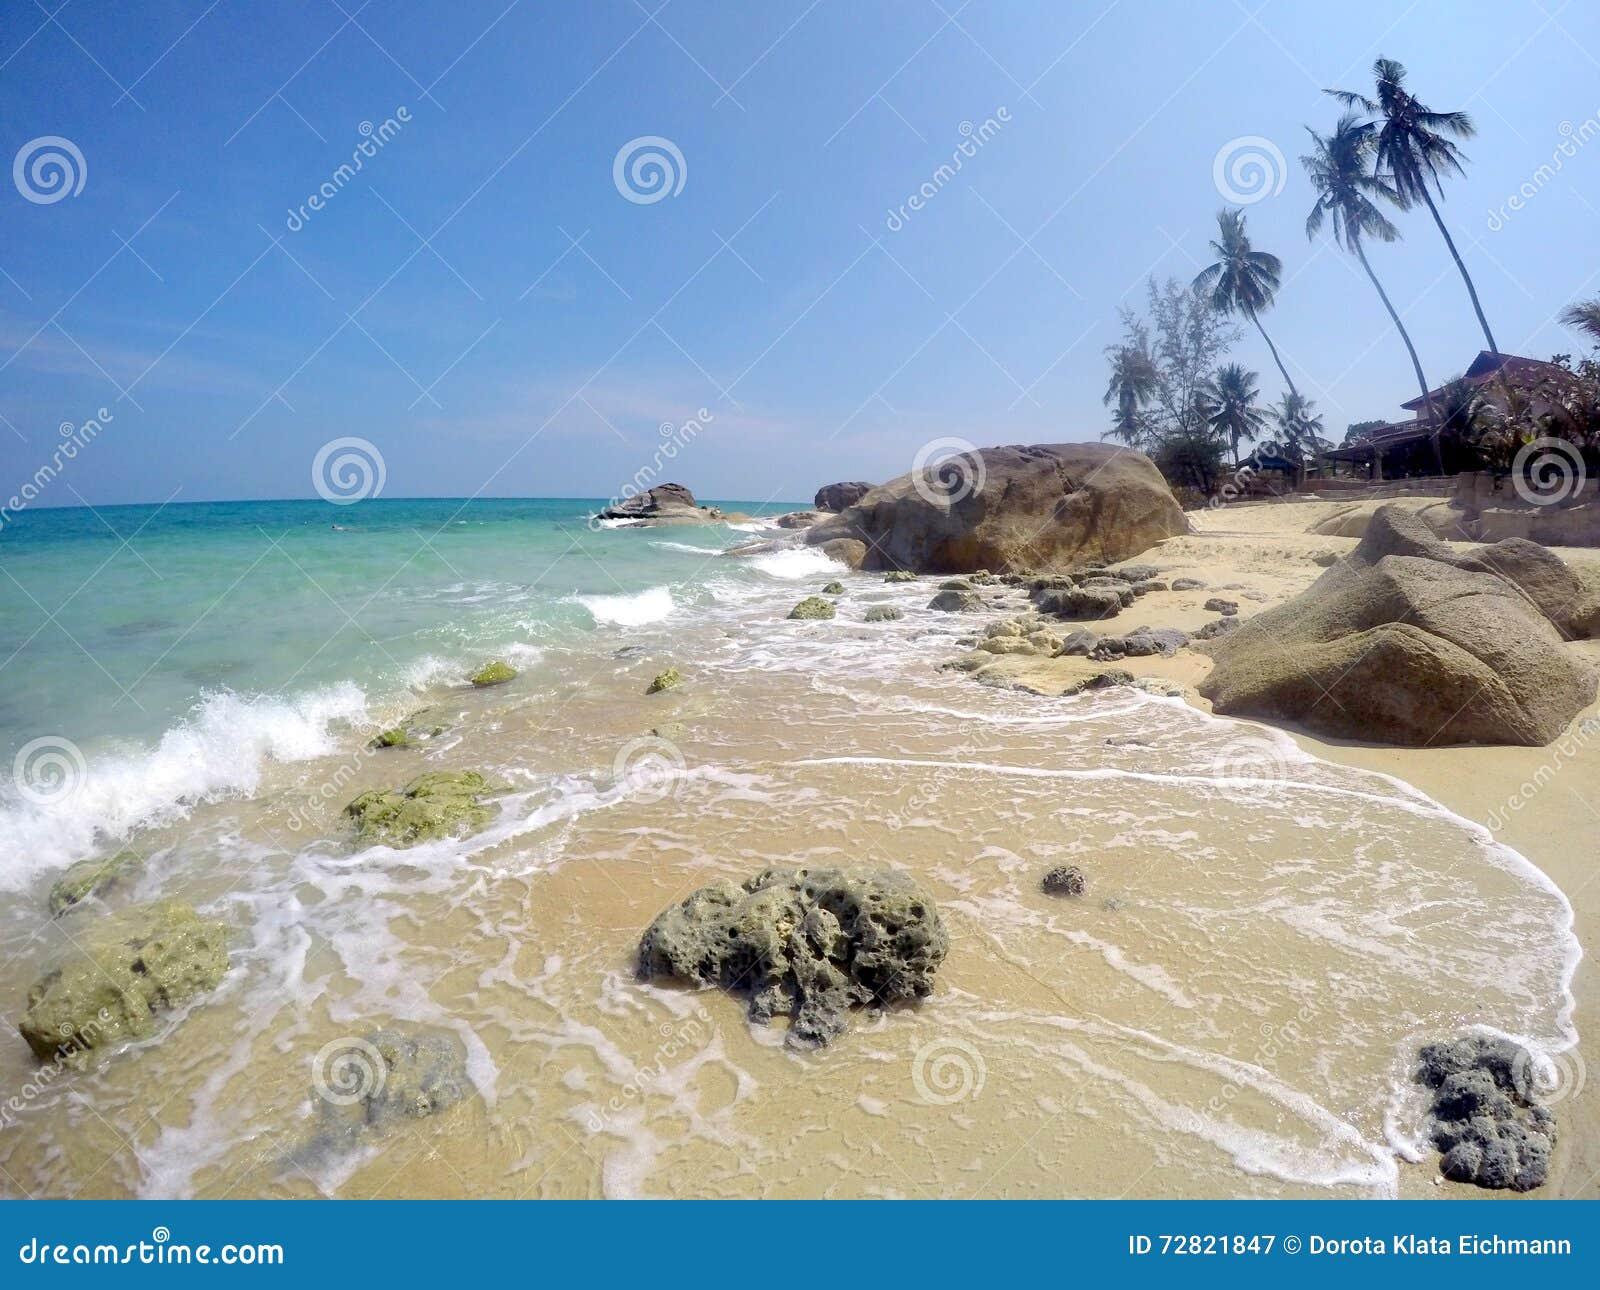 Koh Samui Thailand Paradise Island